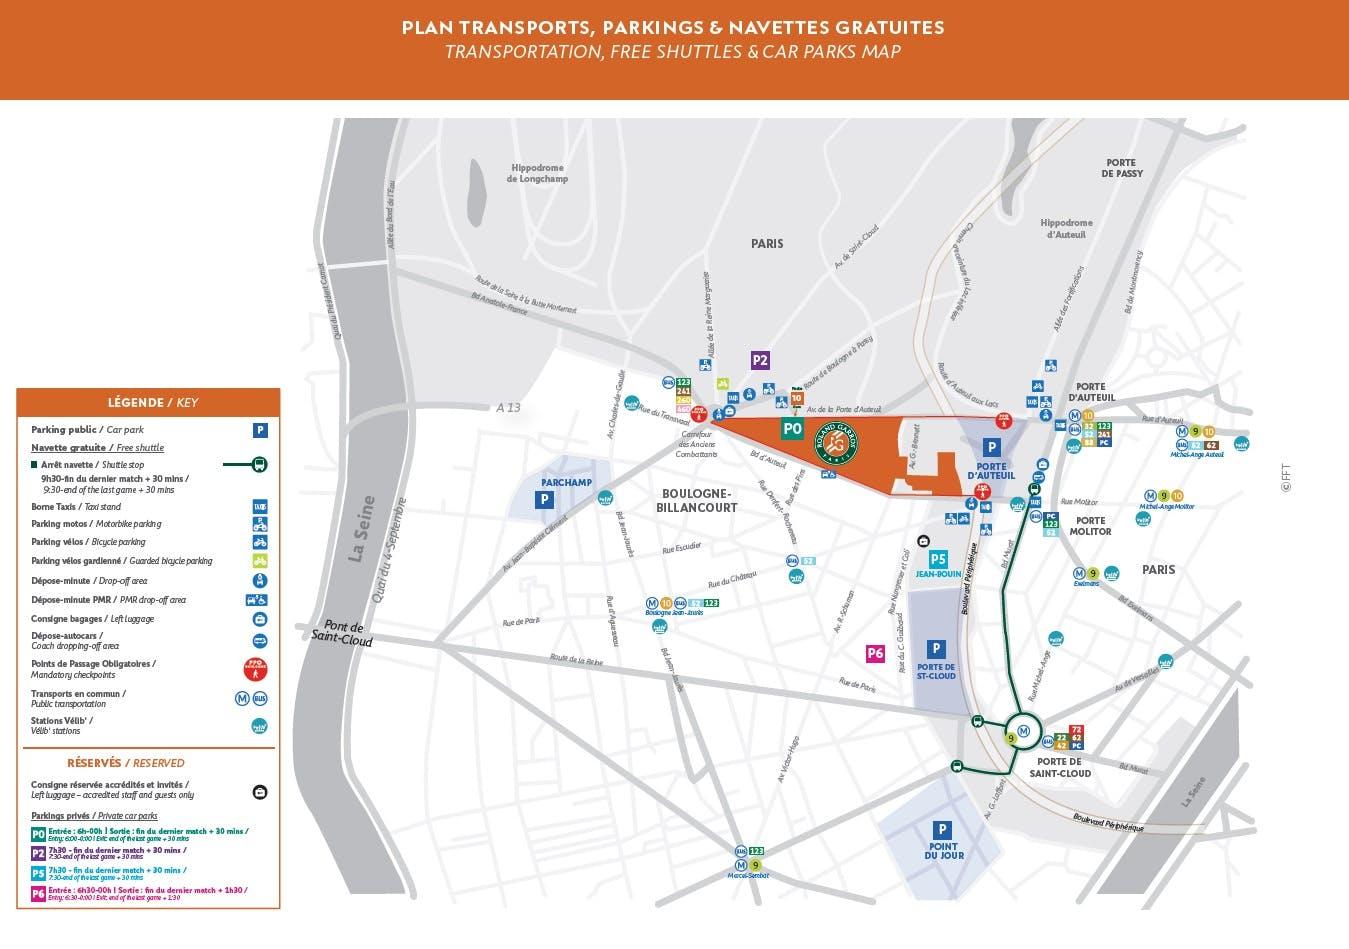 Plan Transports Roland-Garros